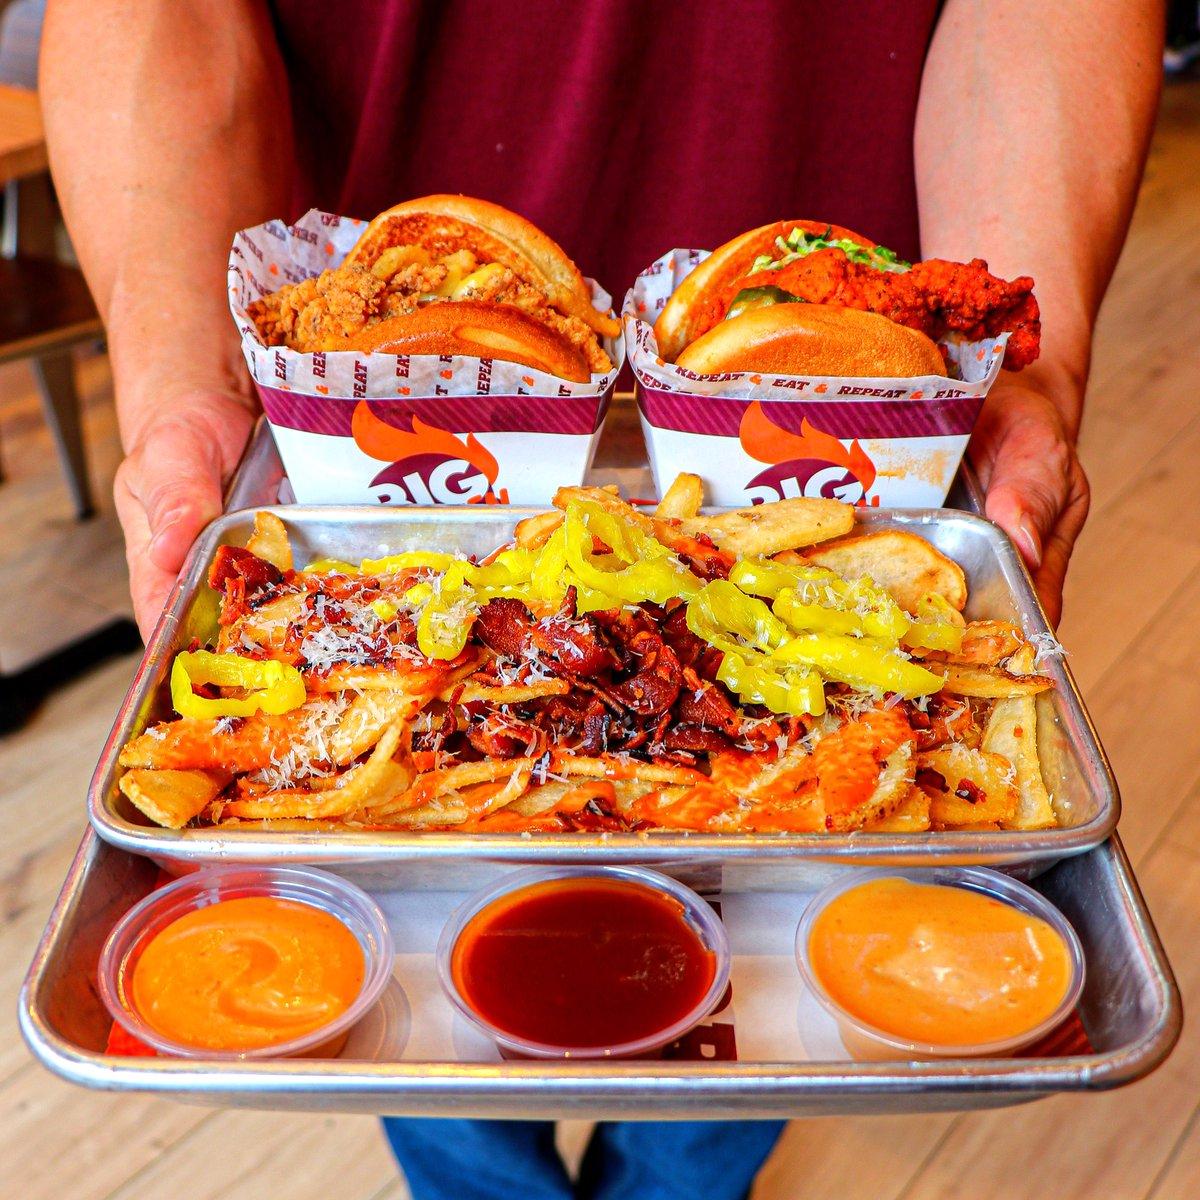 Servin' it fresh daily in Glendale, CA and Las Vegas, NV! 🔥🙌🏼🐔 #BigChickenShaq